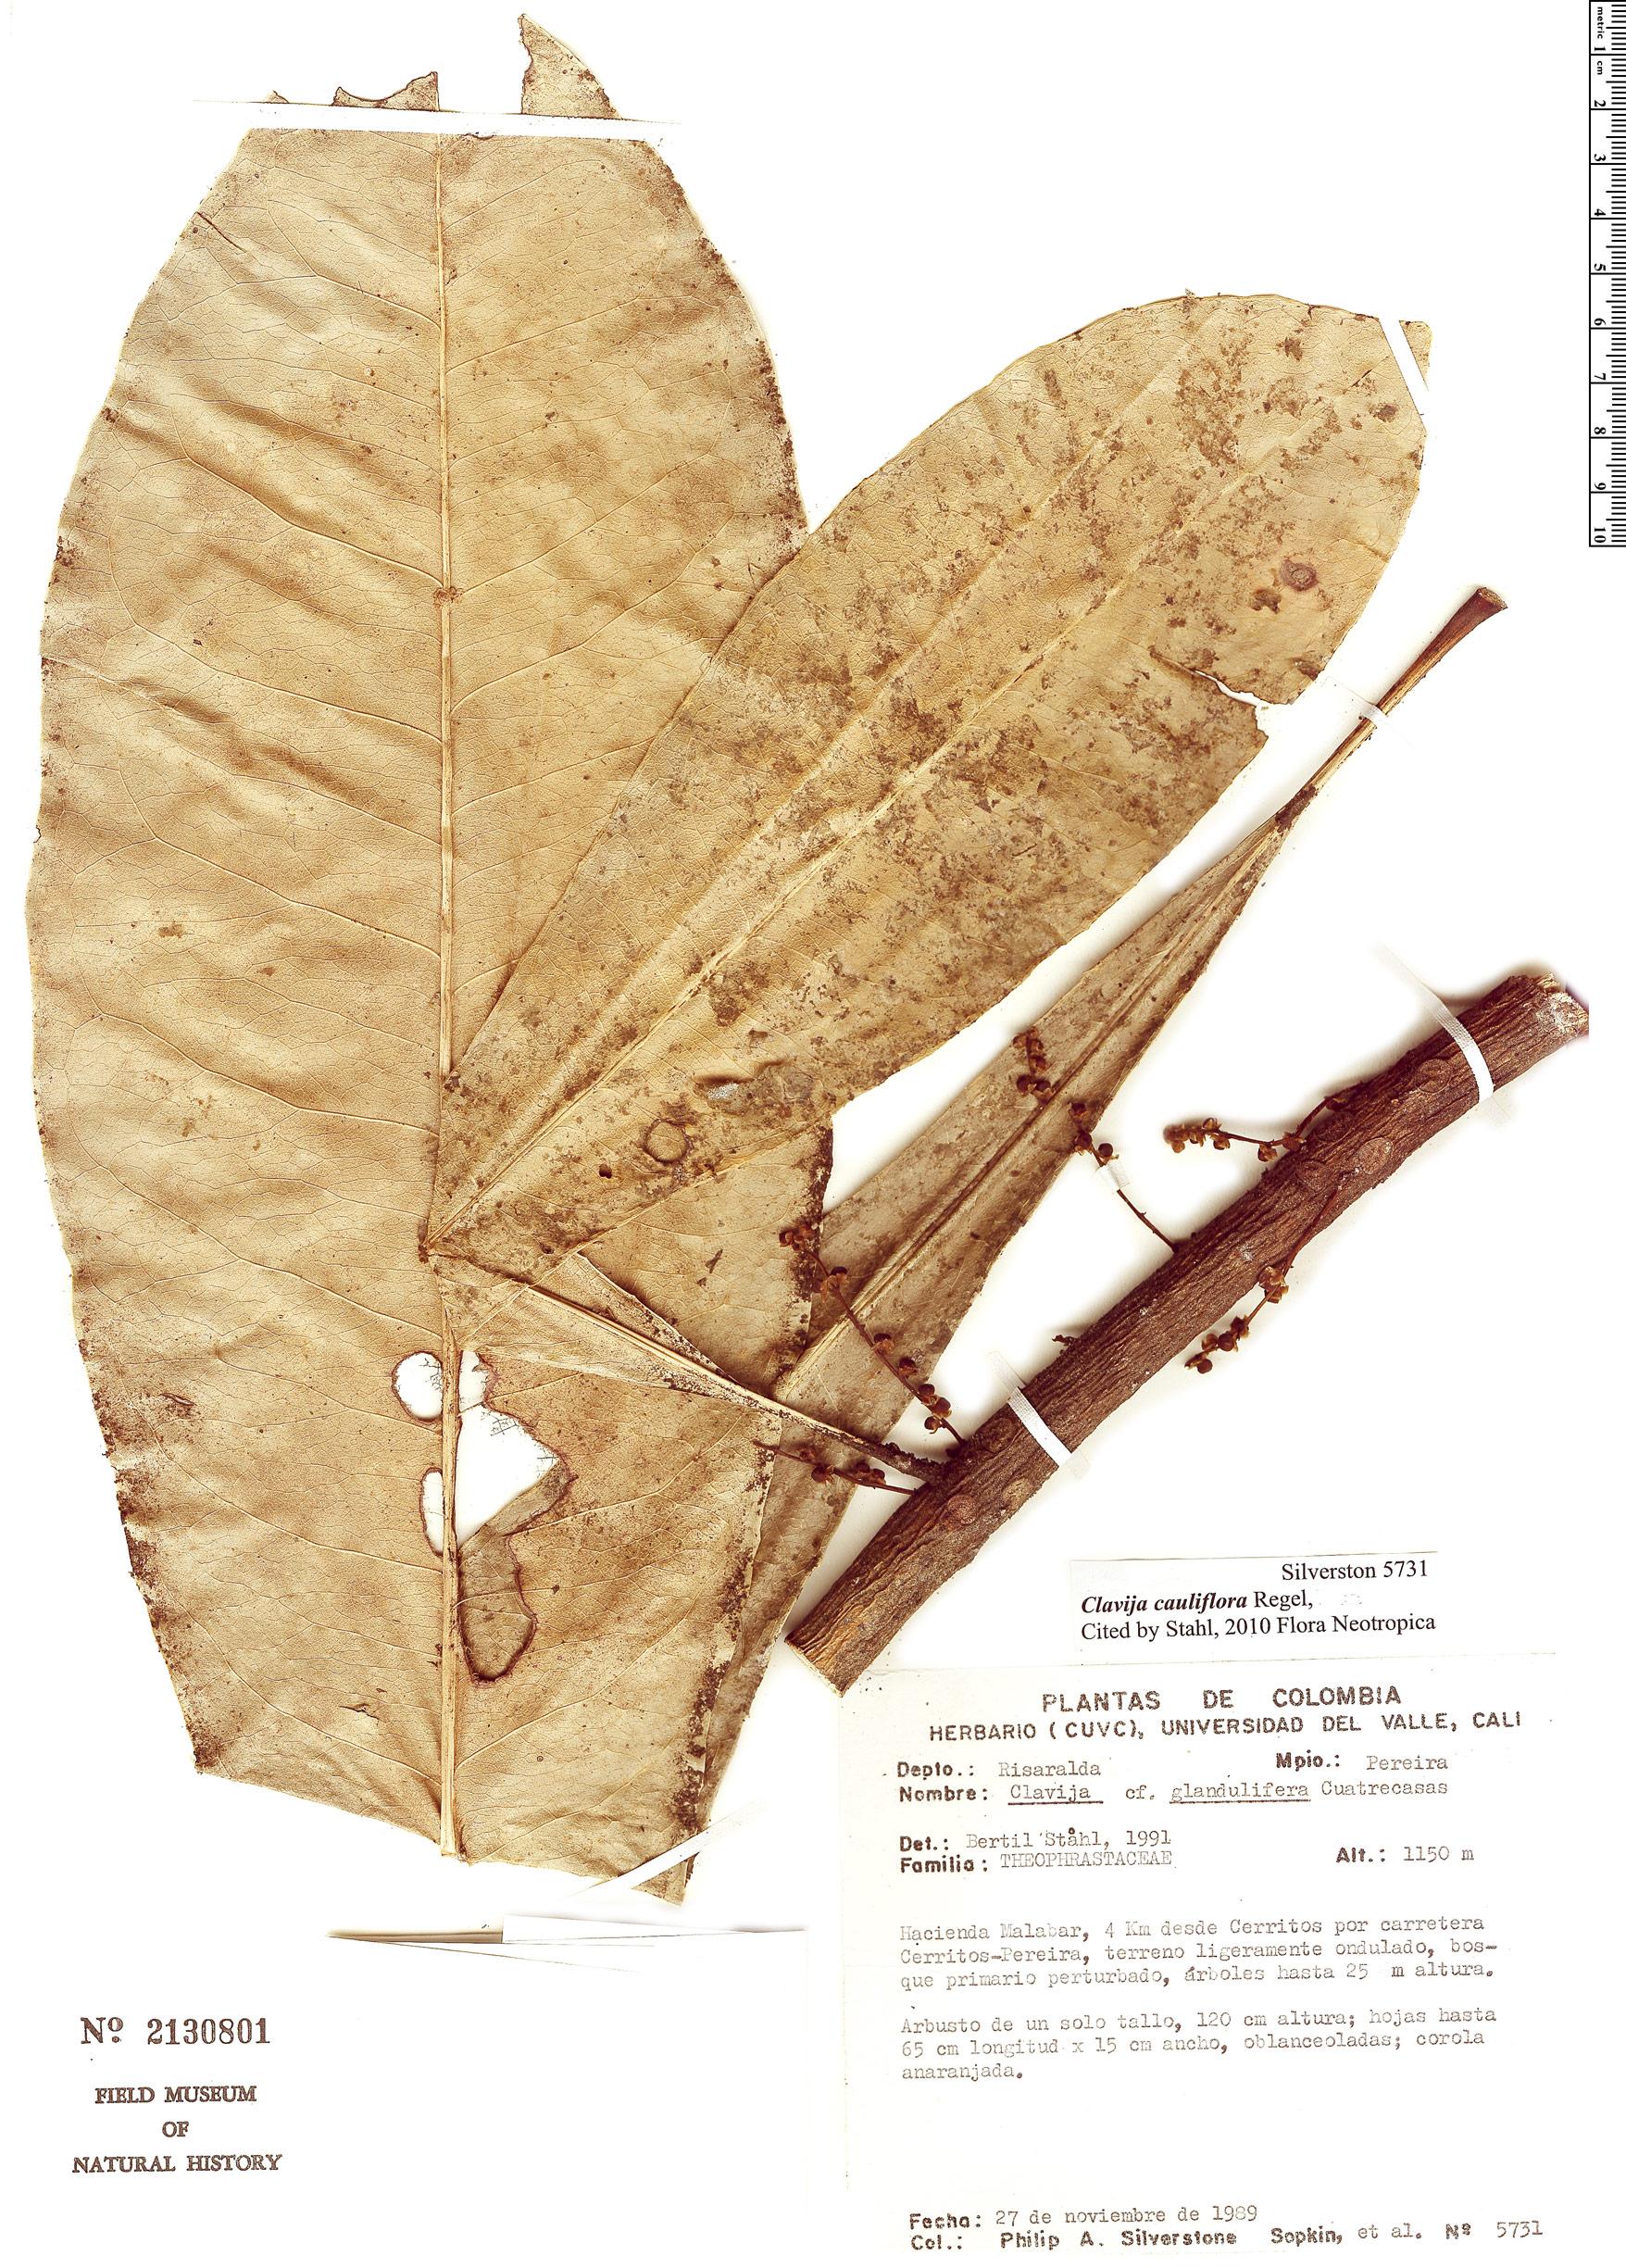 Espécime: Clavija cauliflora